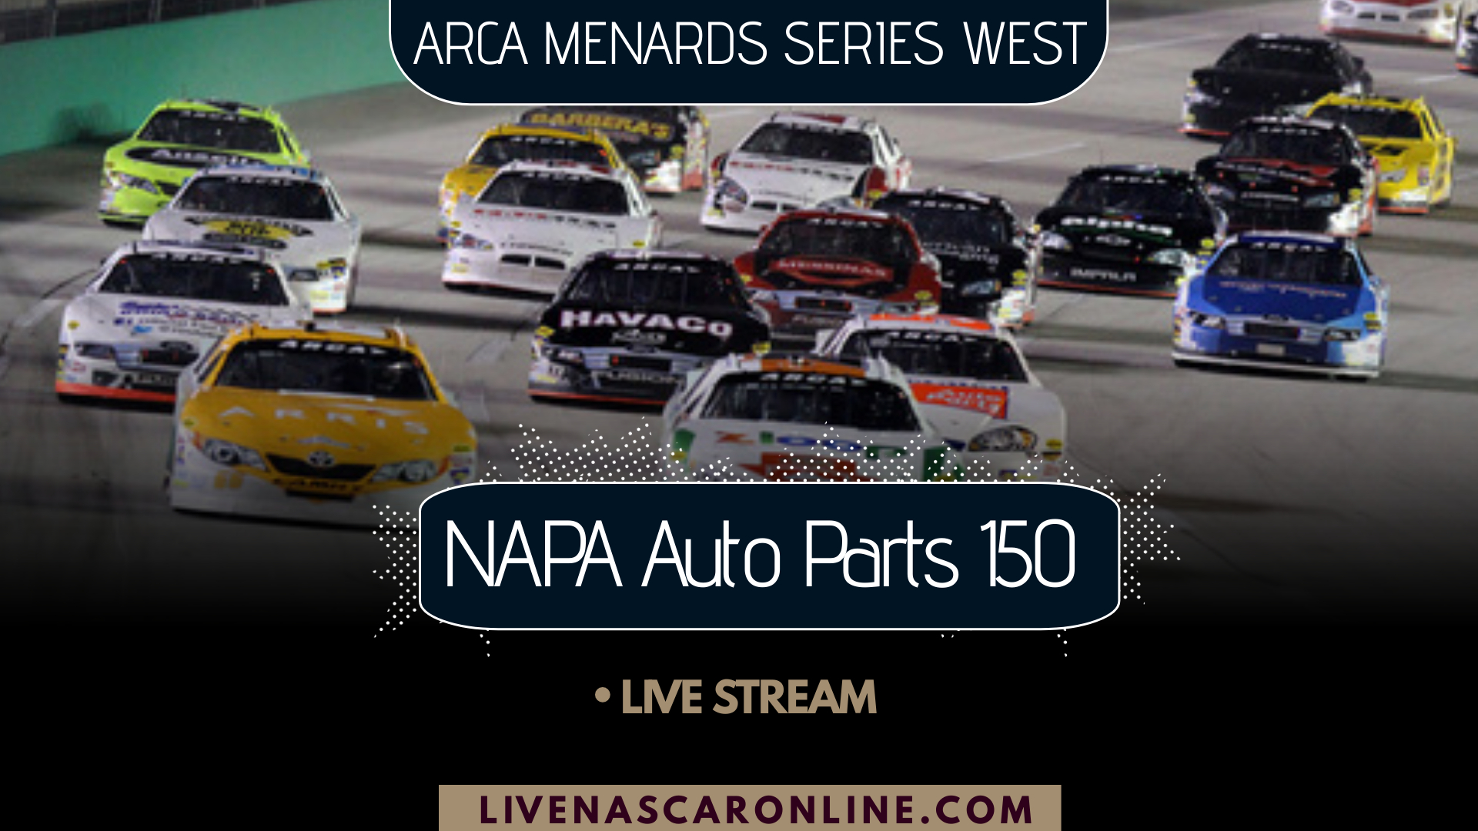 ARCA NAPA Auto Parts 150 Live Stream 2021